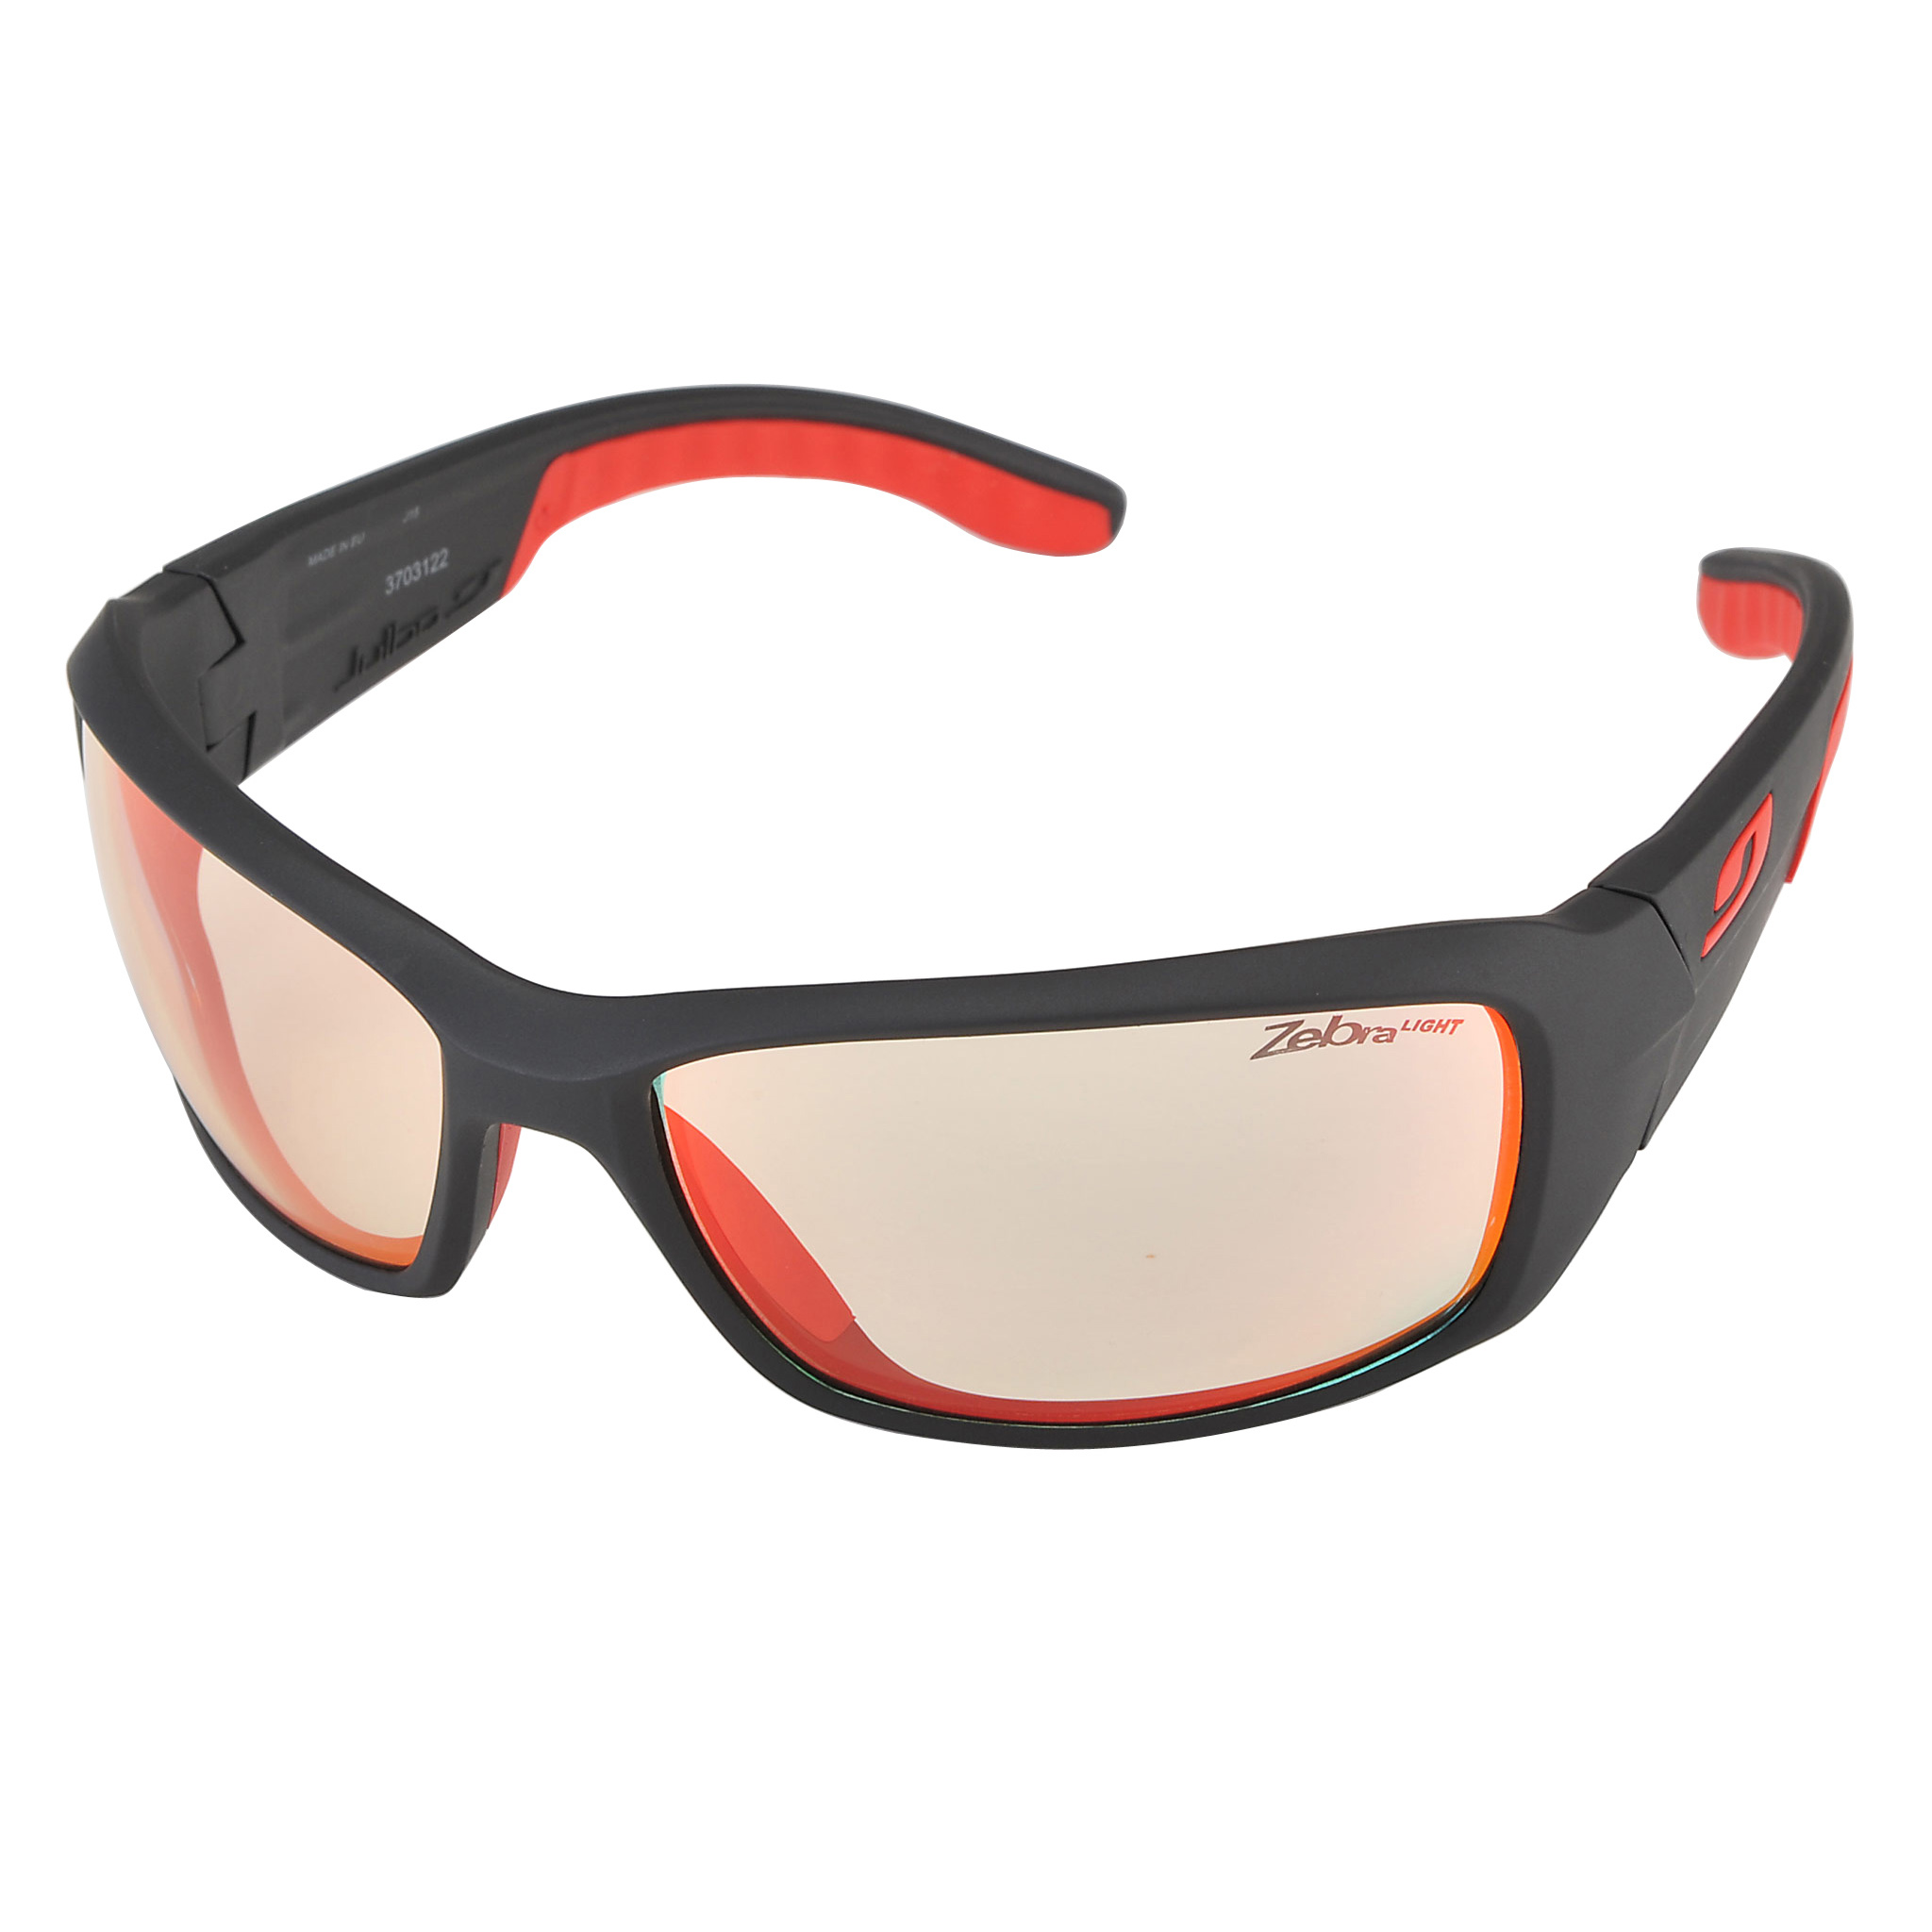 Gafas de sol JULBO RUN Negro/Rojo Fotocromáticas J3703122 2016